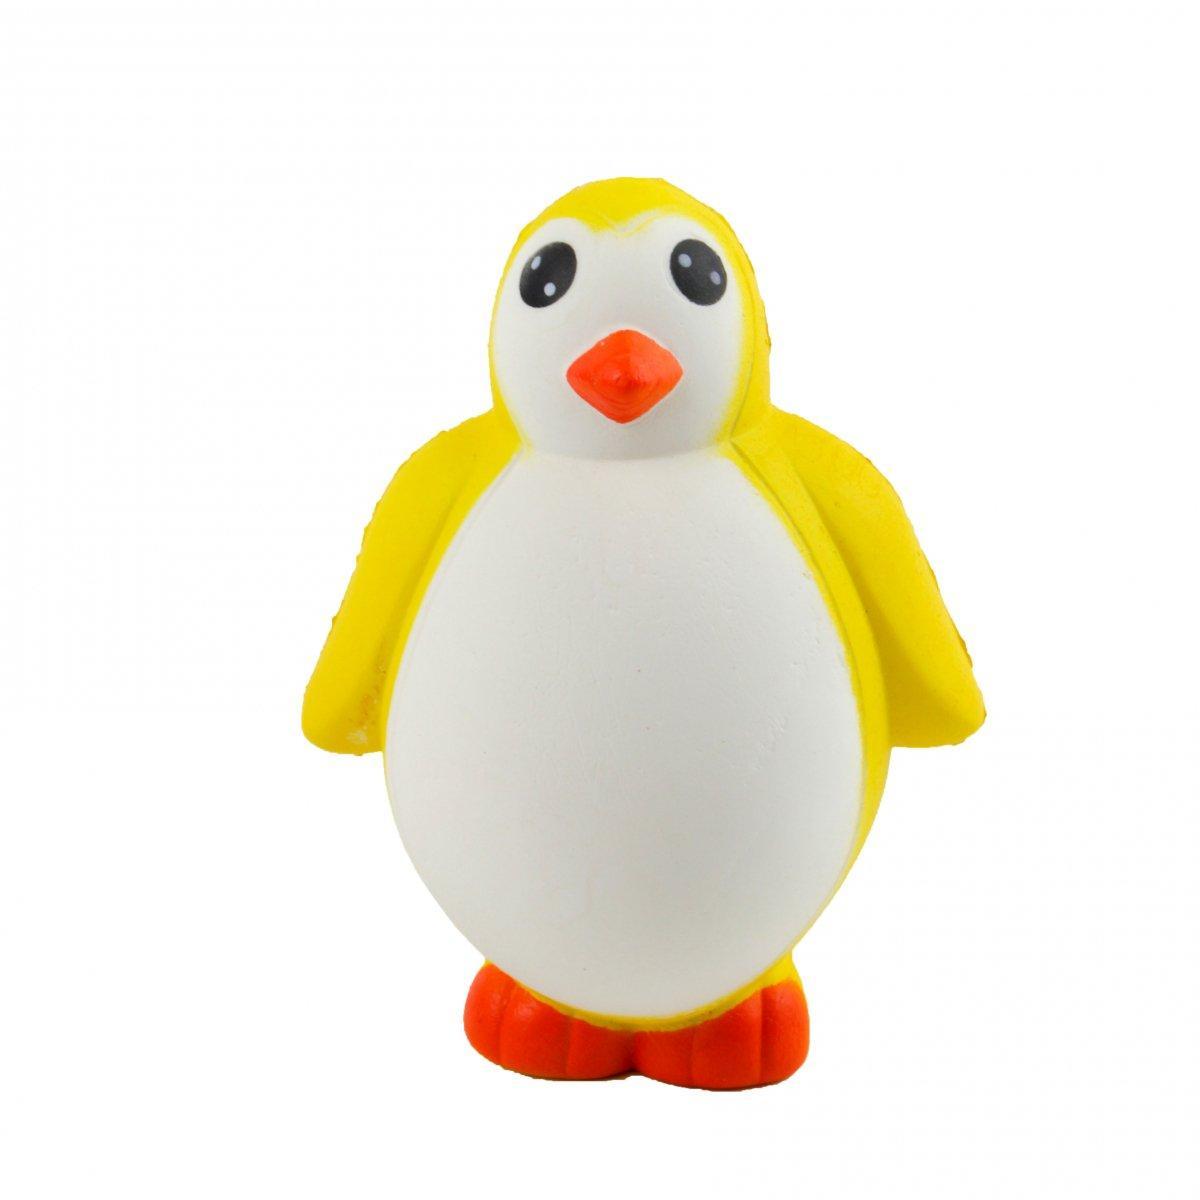 Сквиши игрушка антистресс Squishy Пингвины болшие 132233